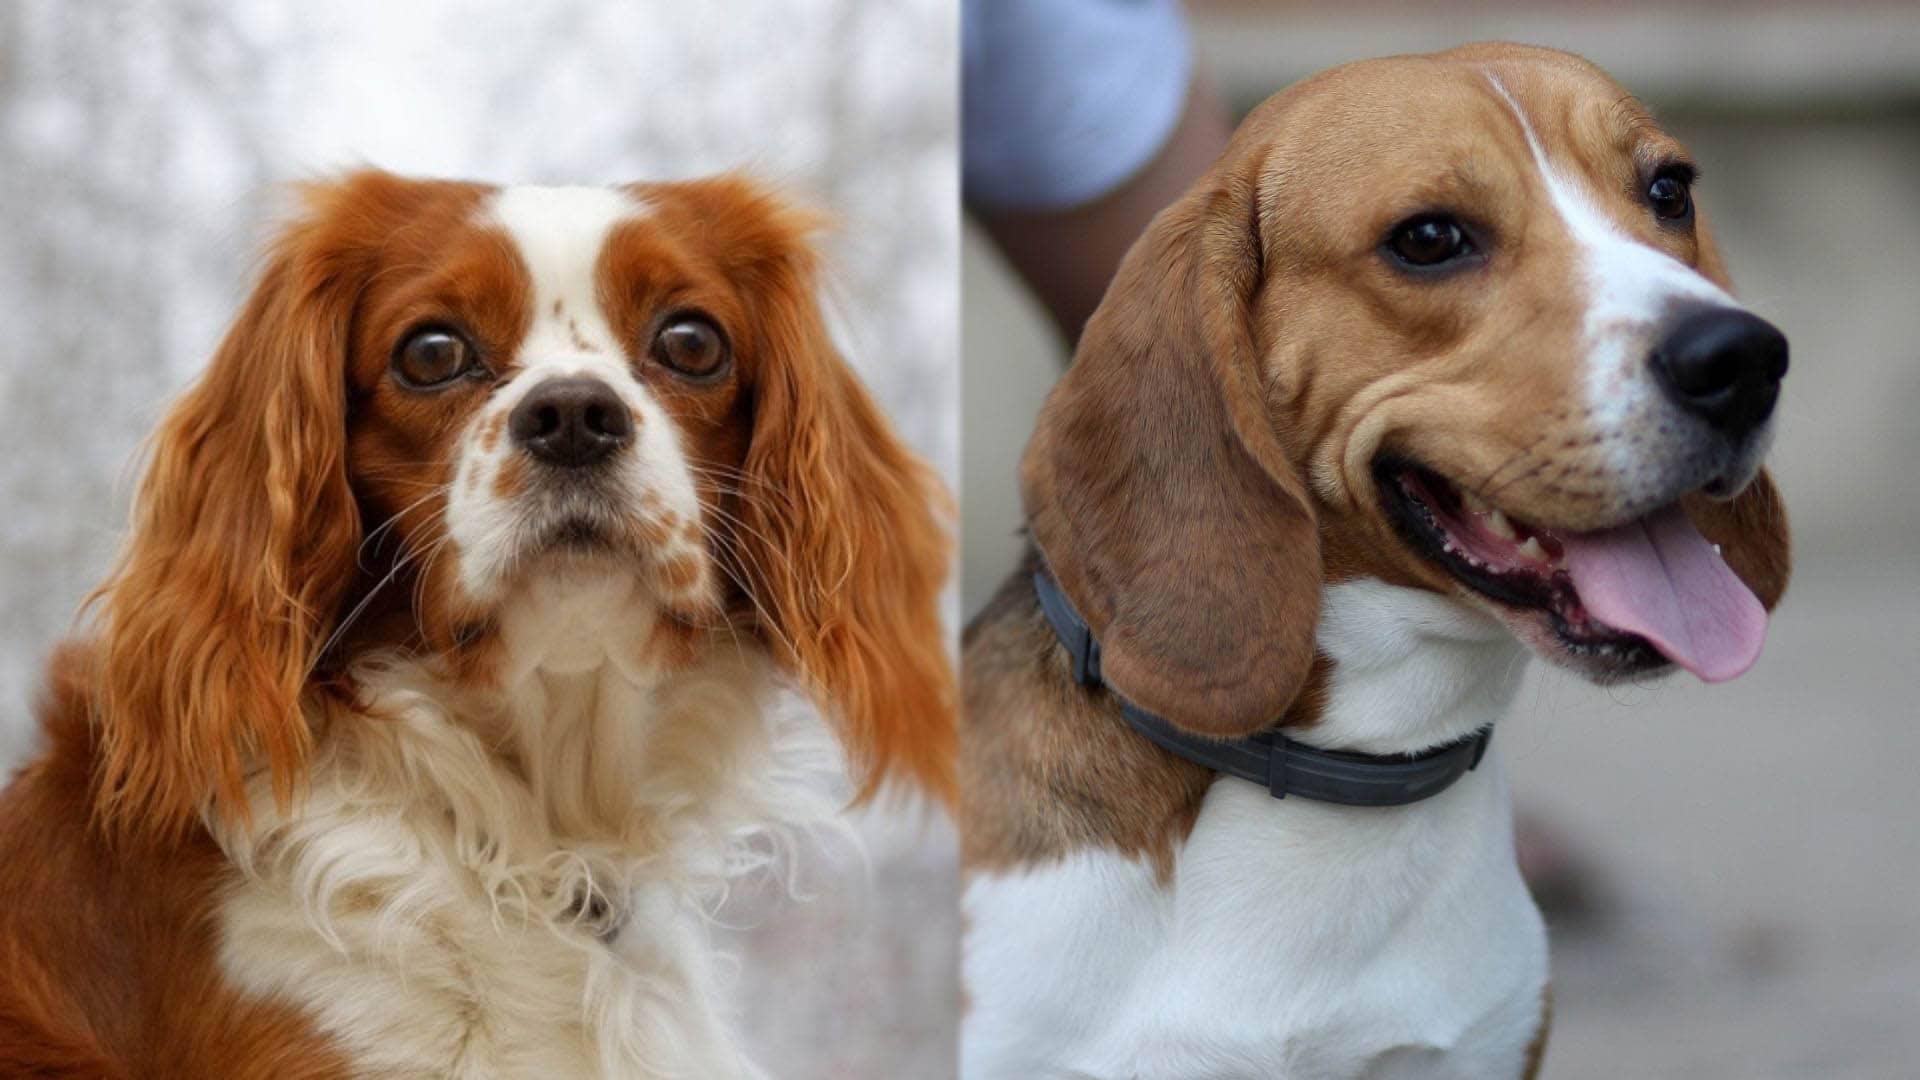 English Speagle - English Toy Spaniel and Beagle Mix